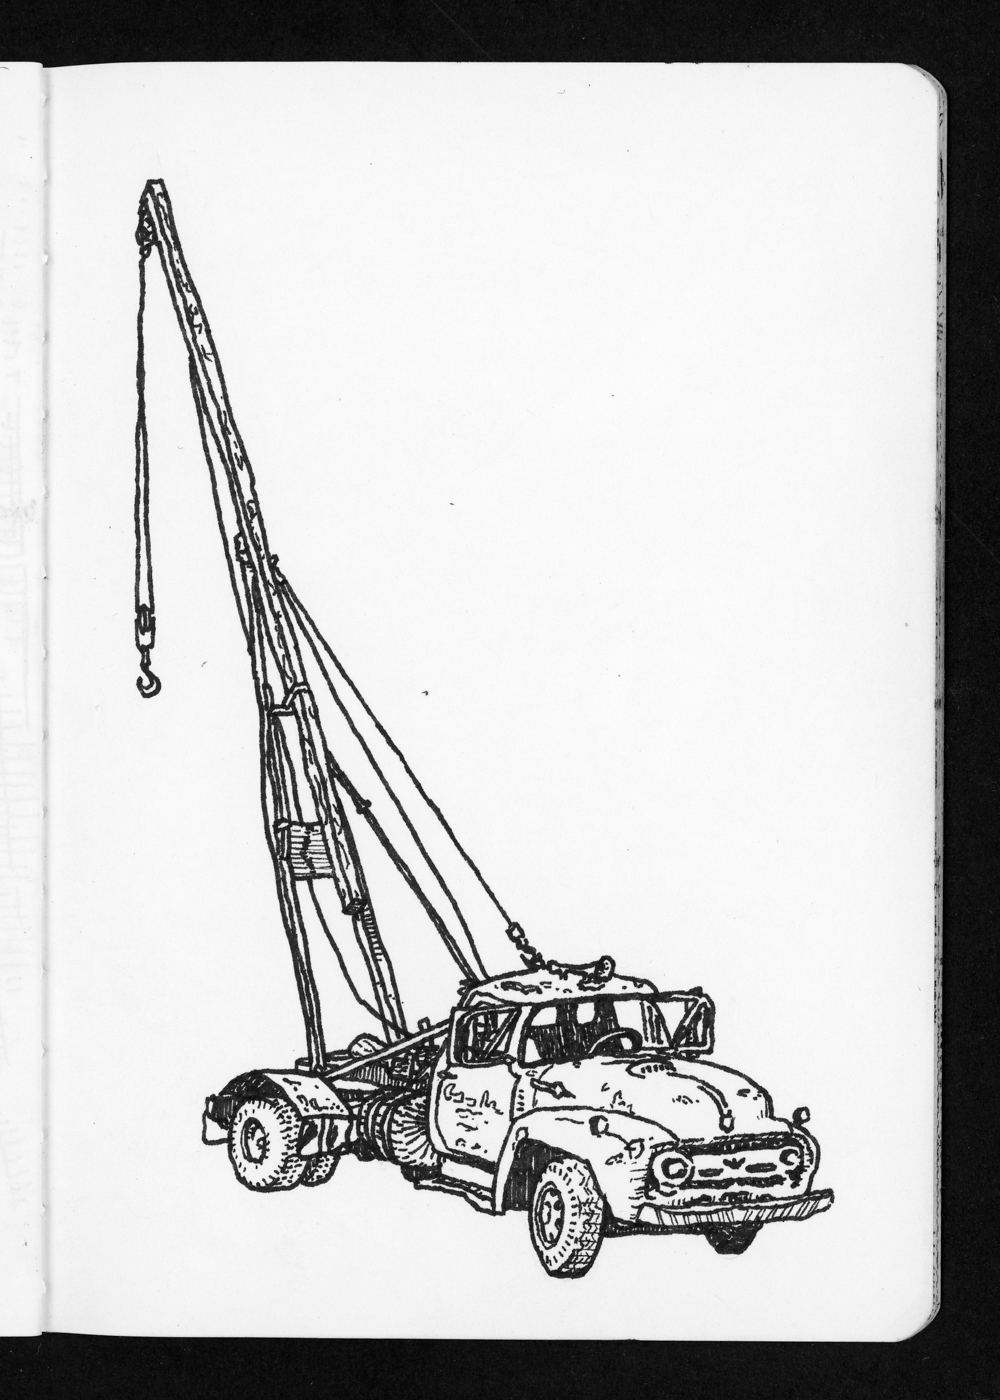 05-18 Old tow truck in Peshastin WA.jpg